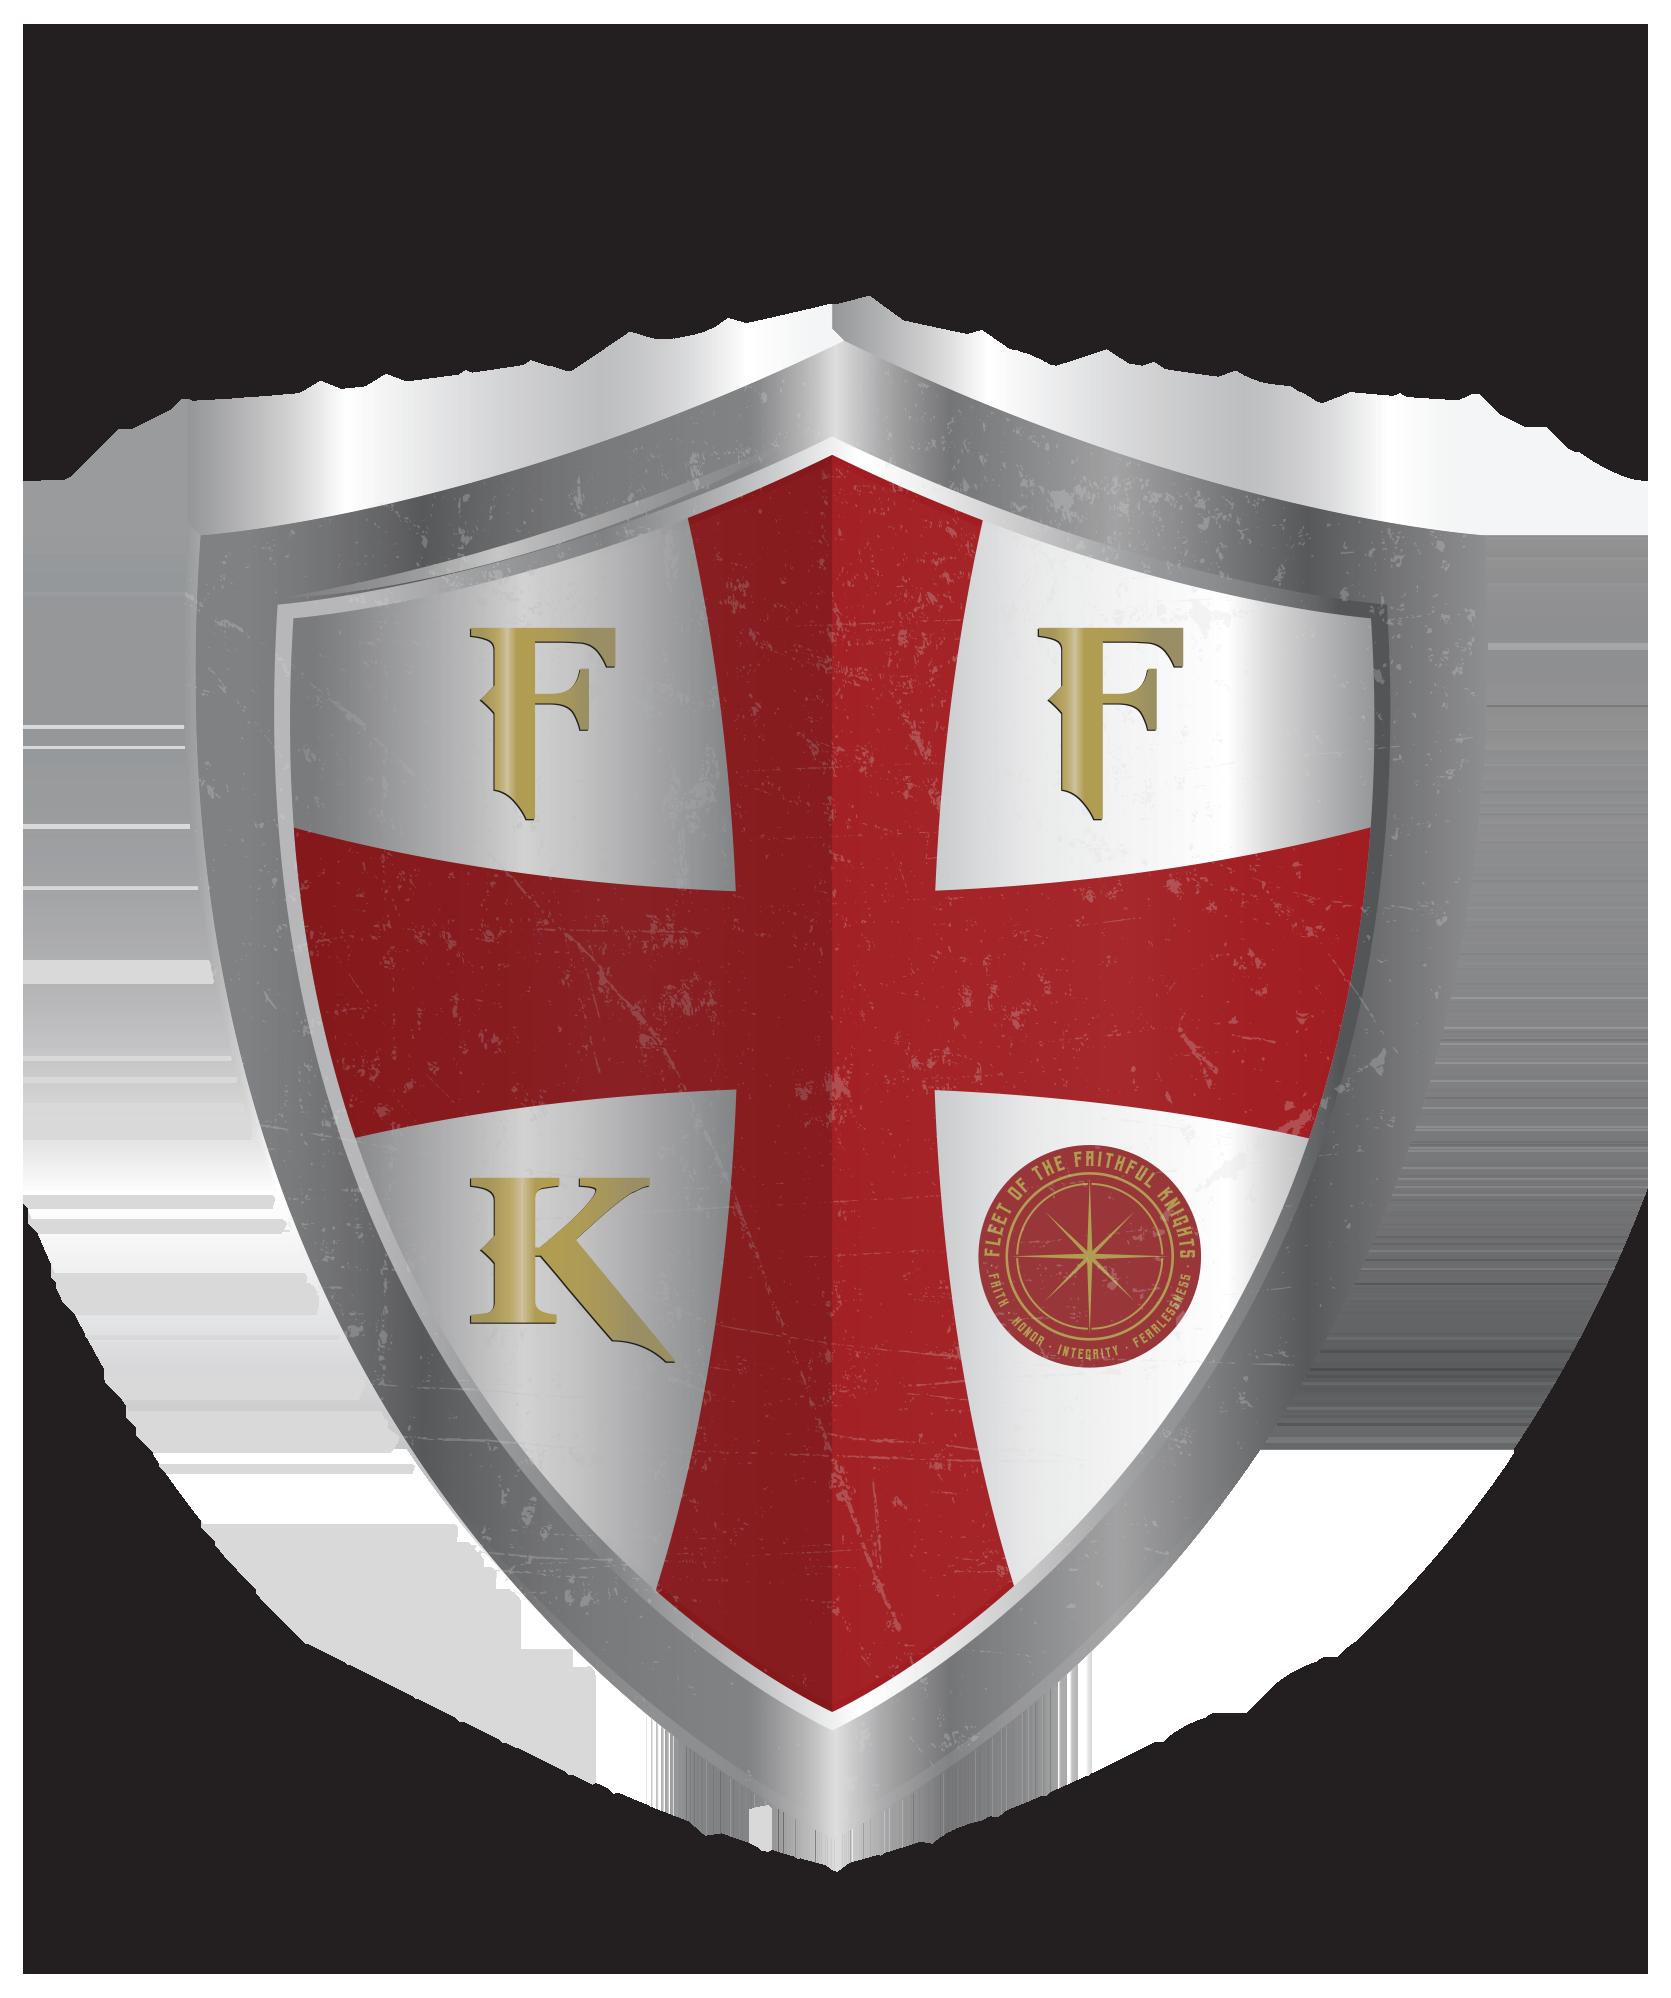 Fleet of the faithful knights logo v2